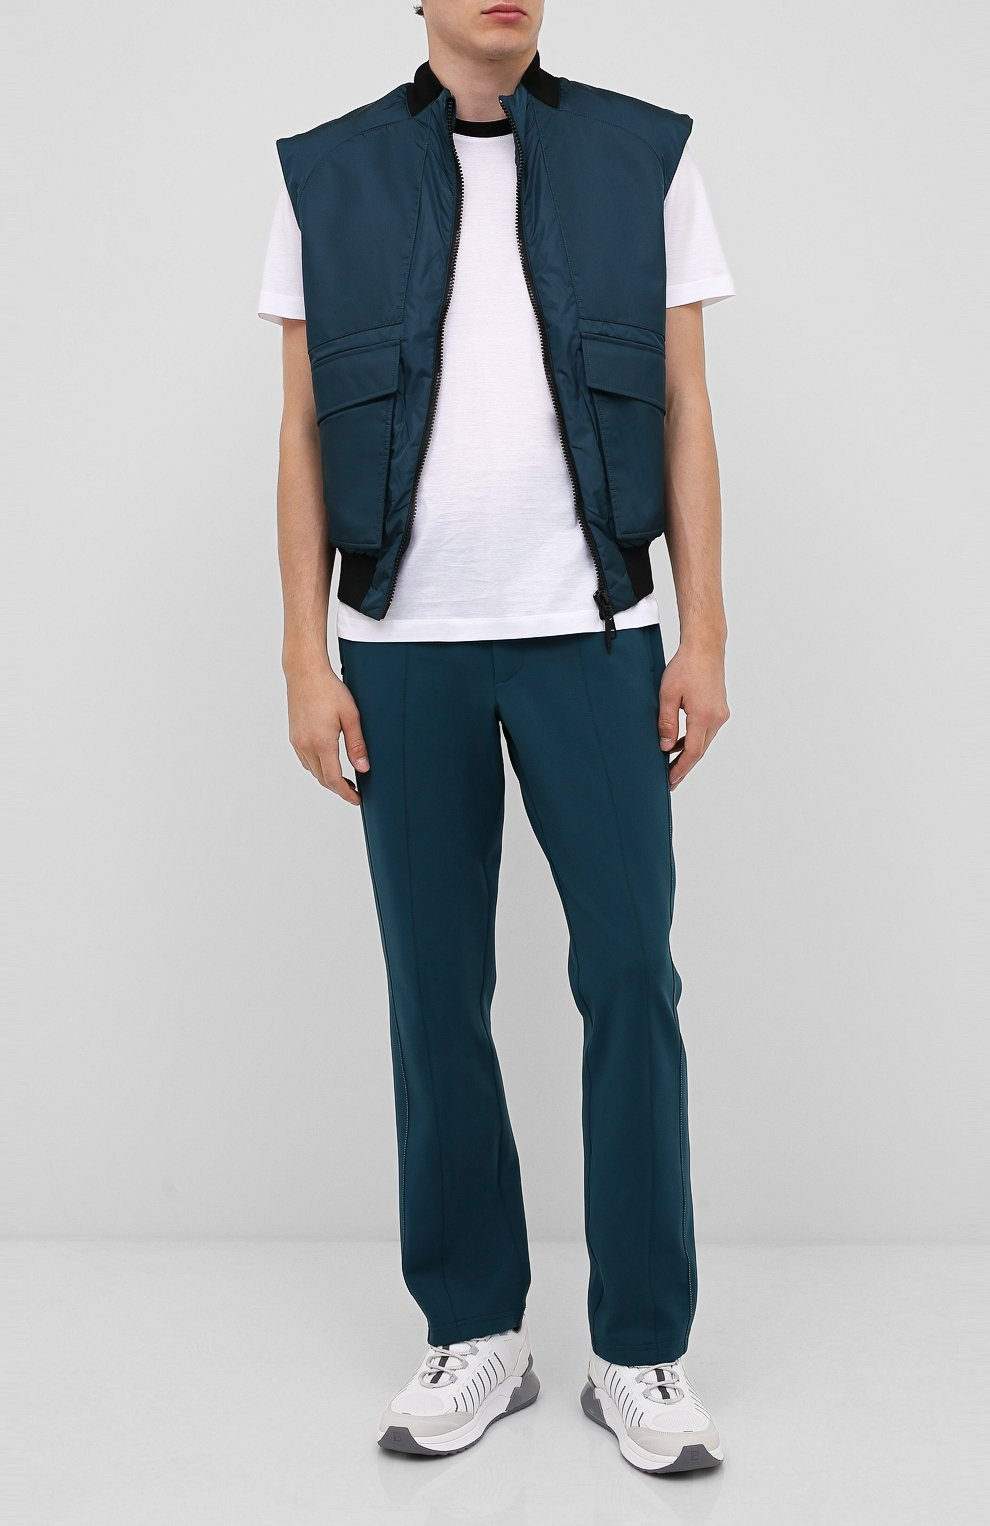 Мужской жилет CROW'S EYE темно-бирюзового цвета, арт. LE 65   Фото 2 (Кросс-КТ: Куртка; Материал внешний: Синтетический материал; Стили: Спорт-шик; Материал подклада: Синтетический материал; Мужское Кросс-КТ: Верхняя одежда; Длина (верхняя одежда): Короткие)